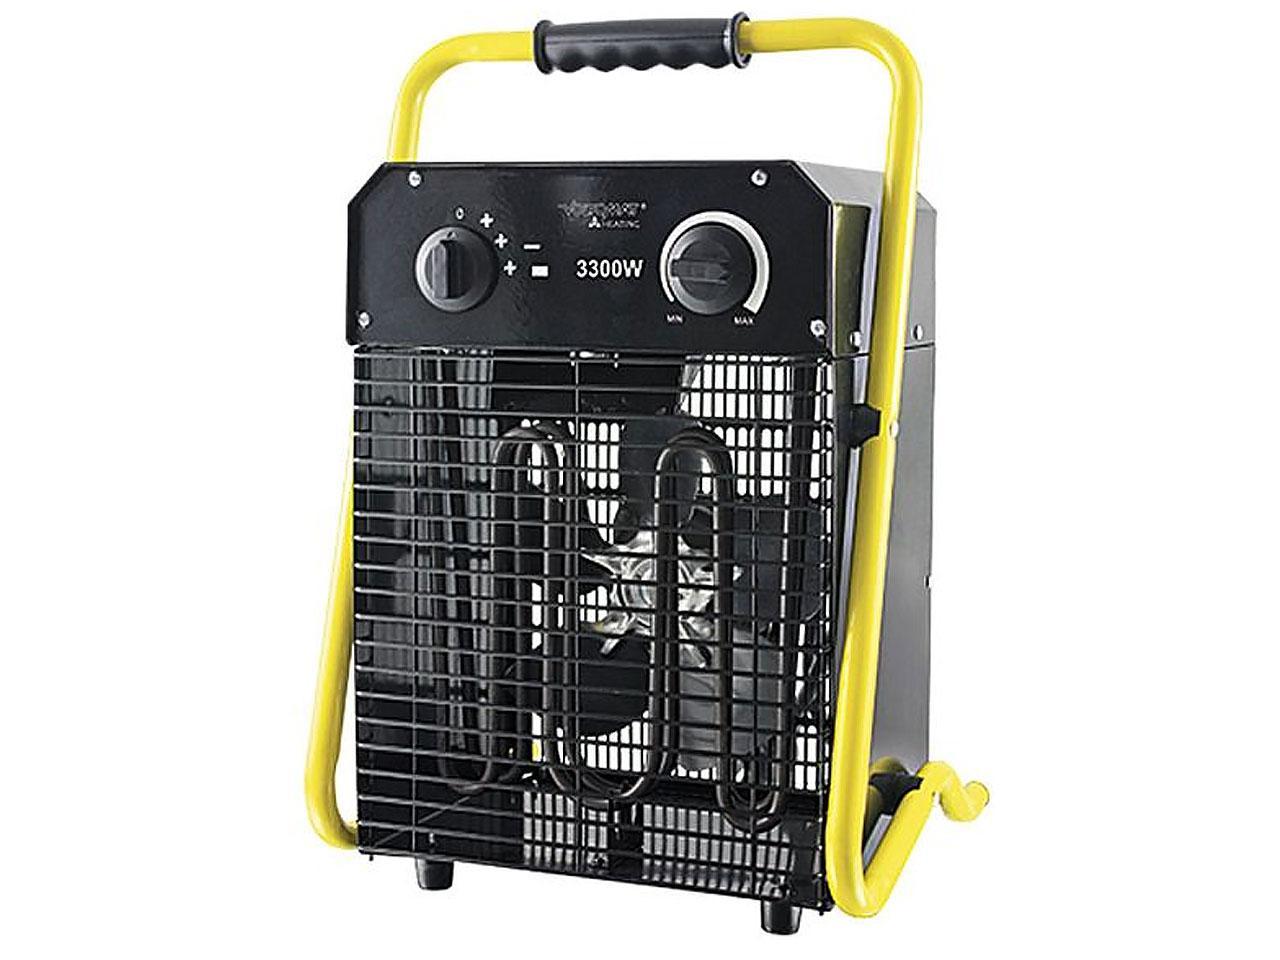 VOLTOMAT Heating LIH-3300E | CHAT on-line podpora PO-NE do 23 hodin!!